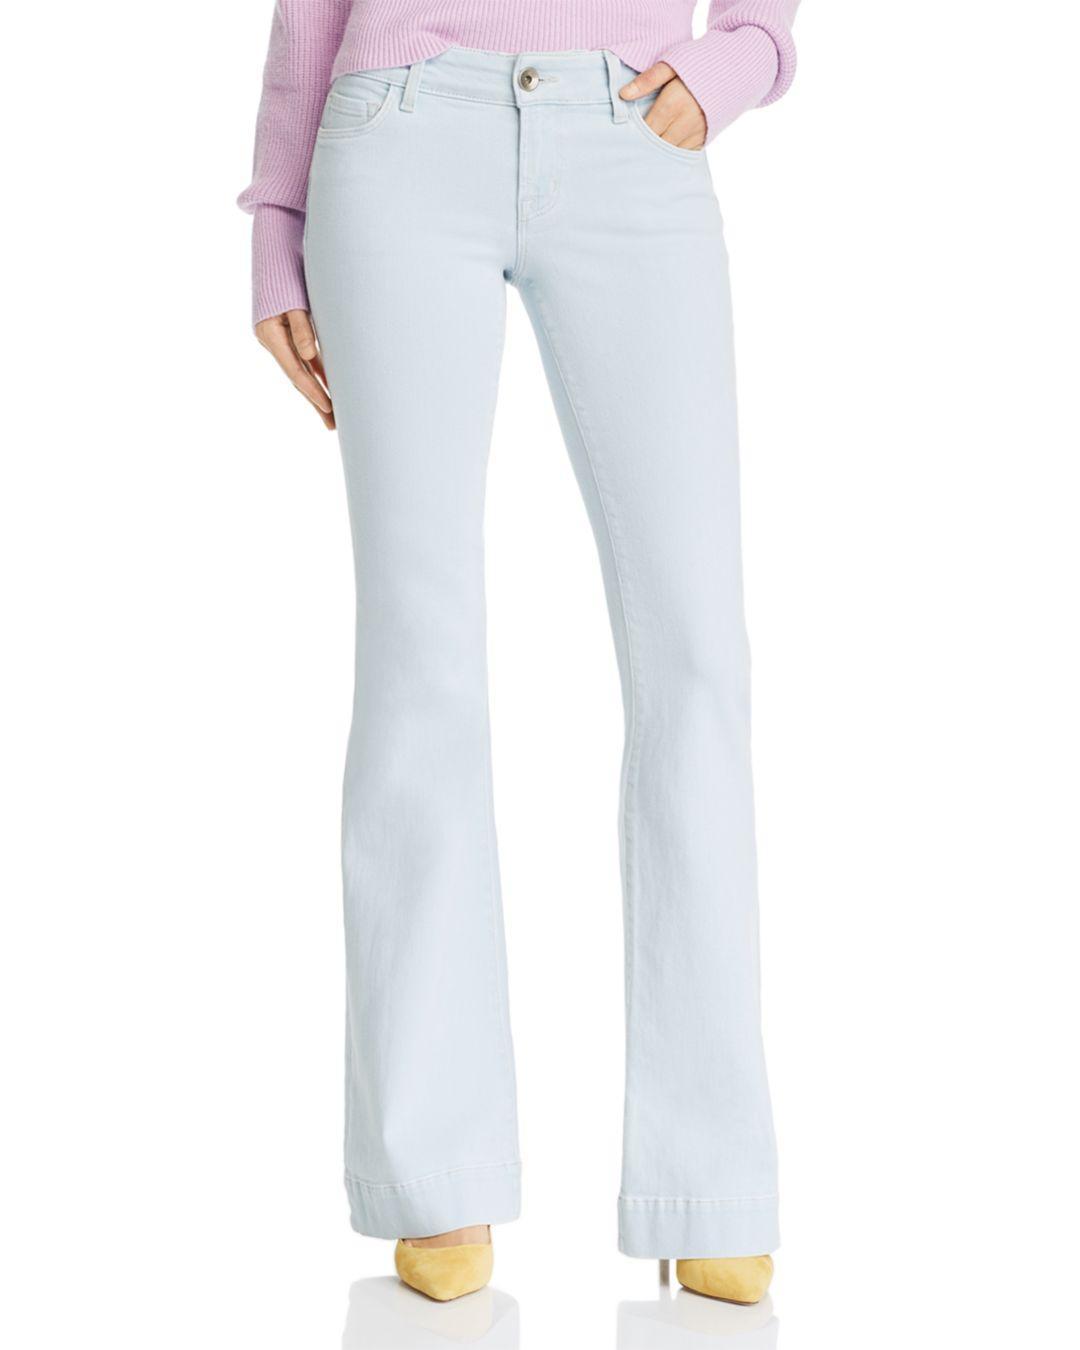 15da8a5f54d8 J Brand Lovestory Flare Jeans In Laser Beam in Blue - Lyst